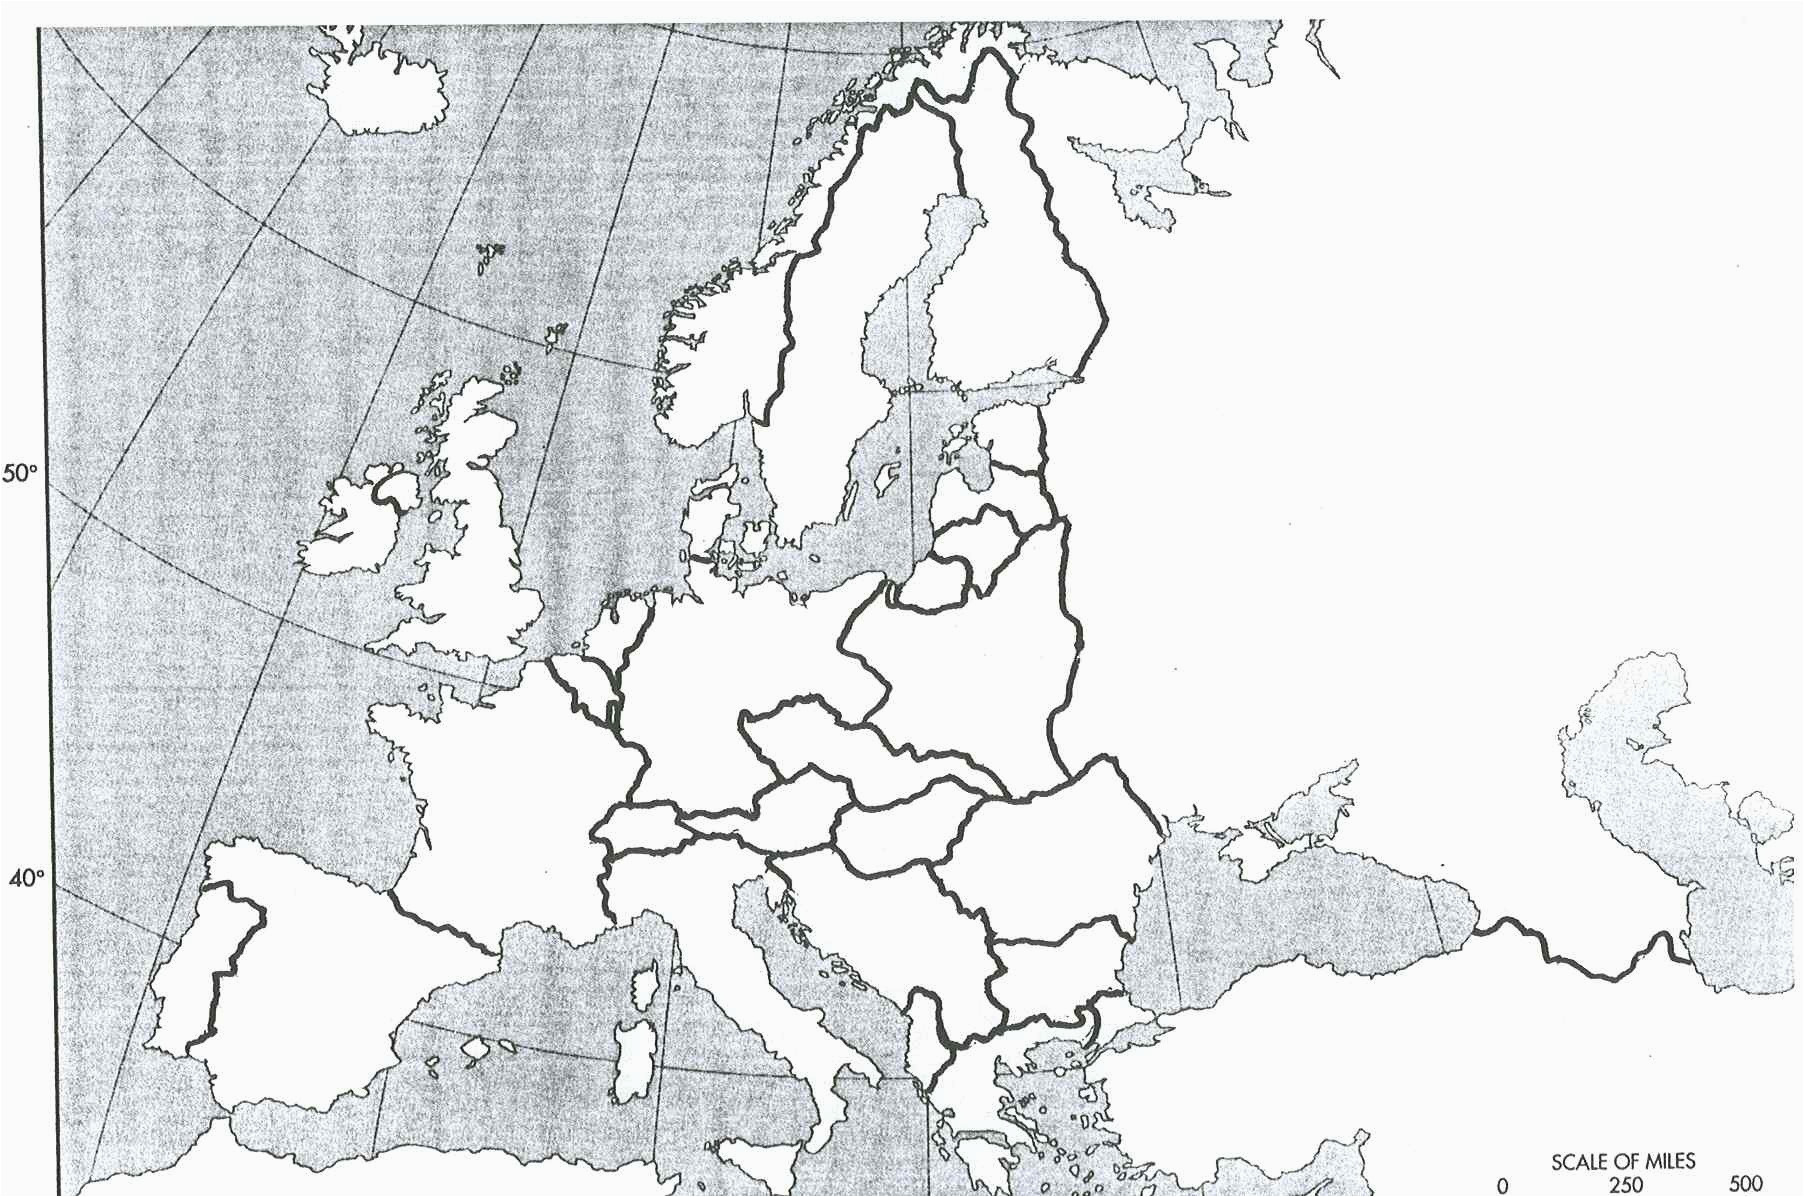 Ww2 Europe Map Quiz History 464 Europe since 1914 Unlv